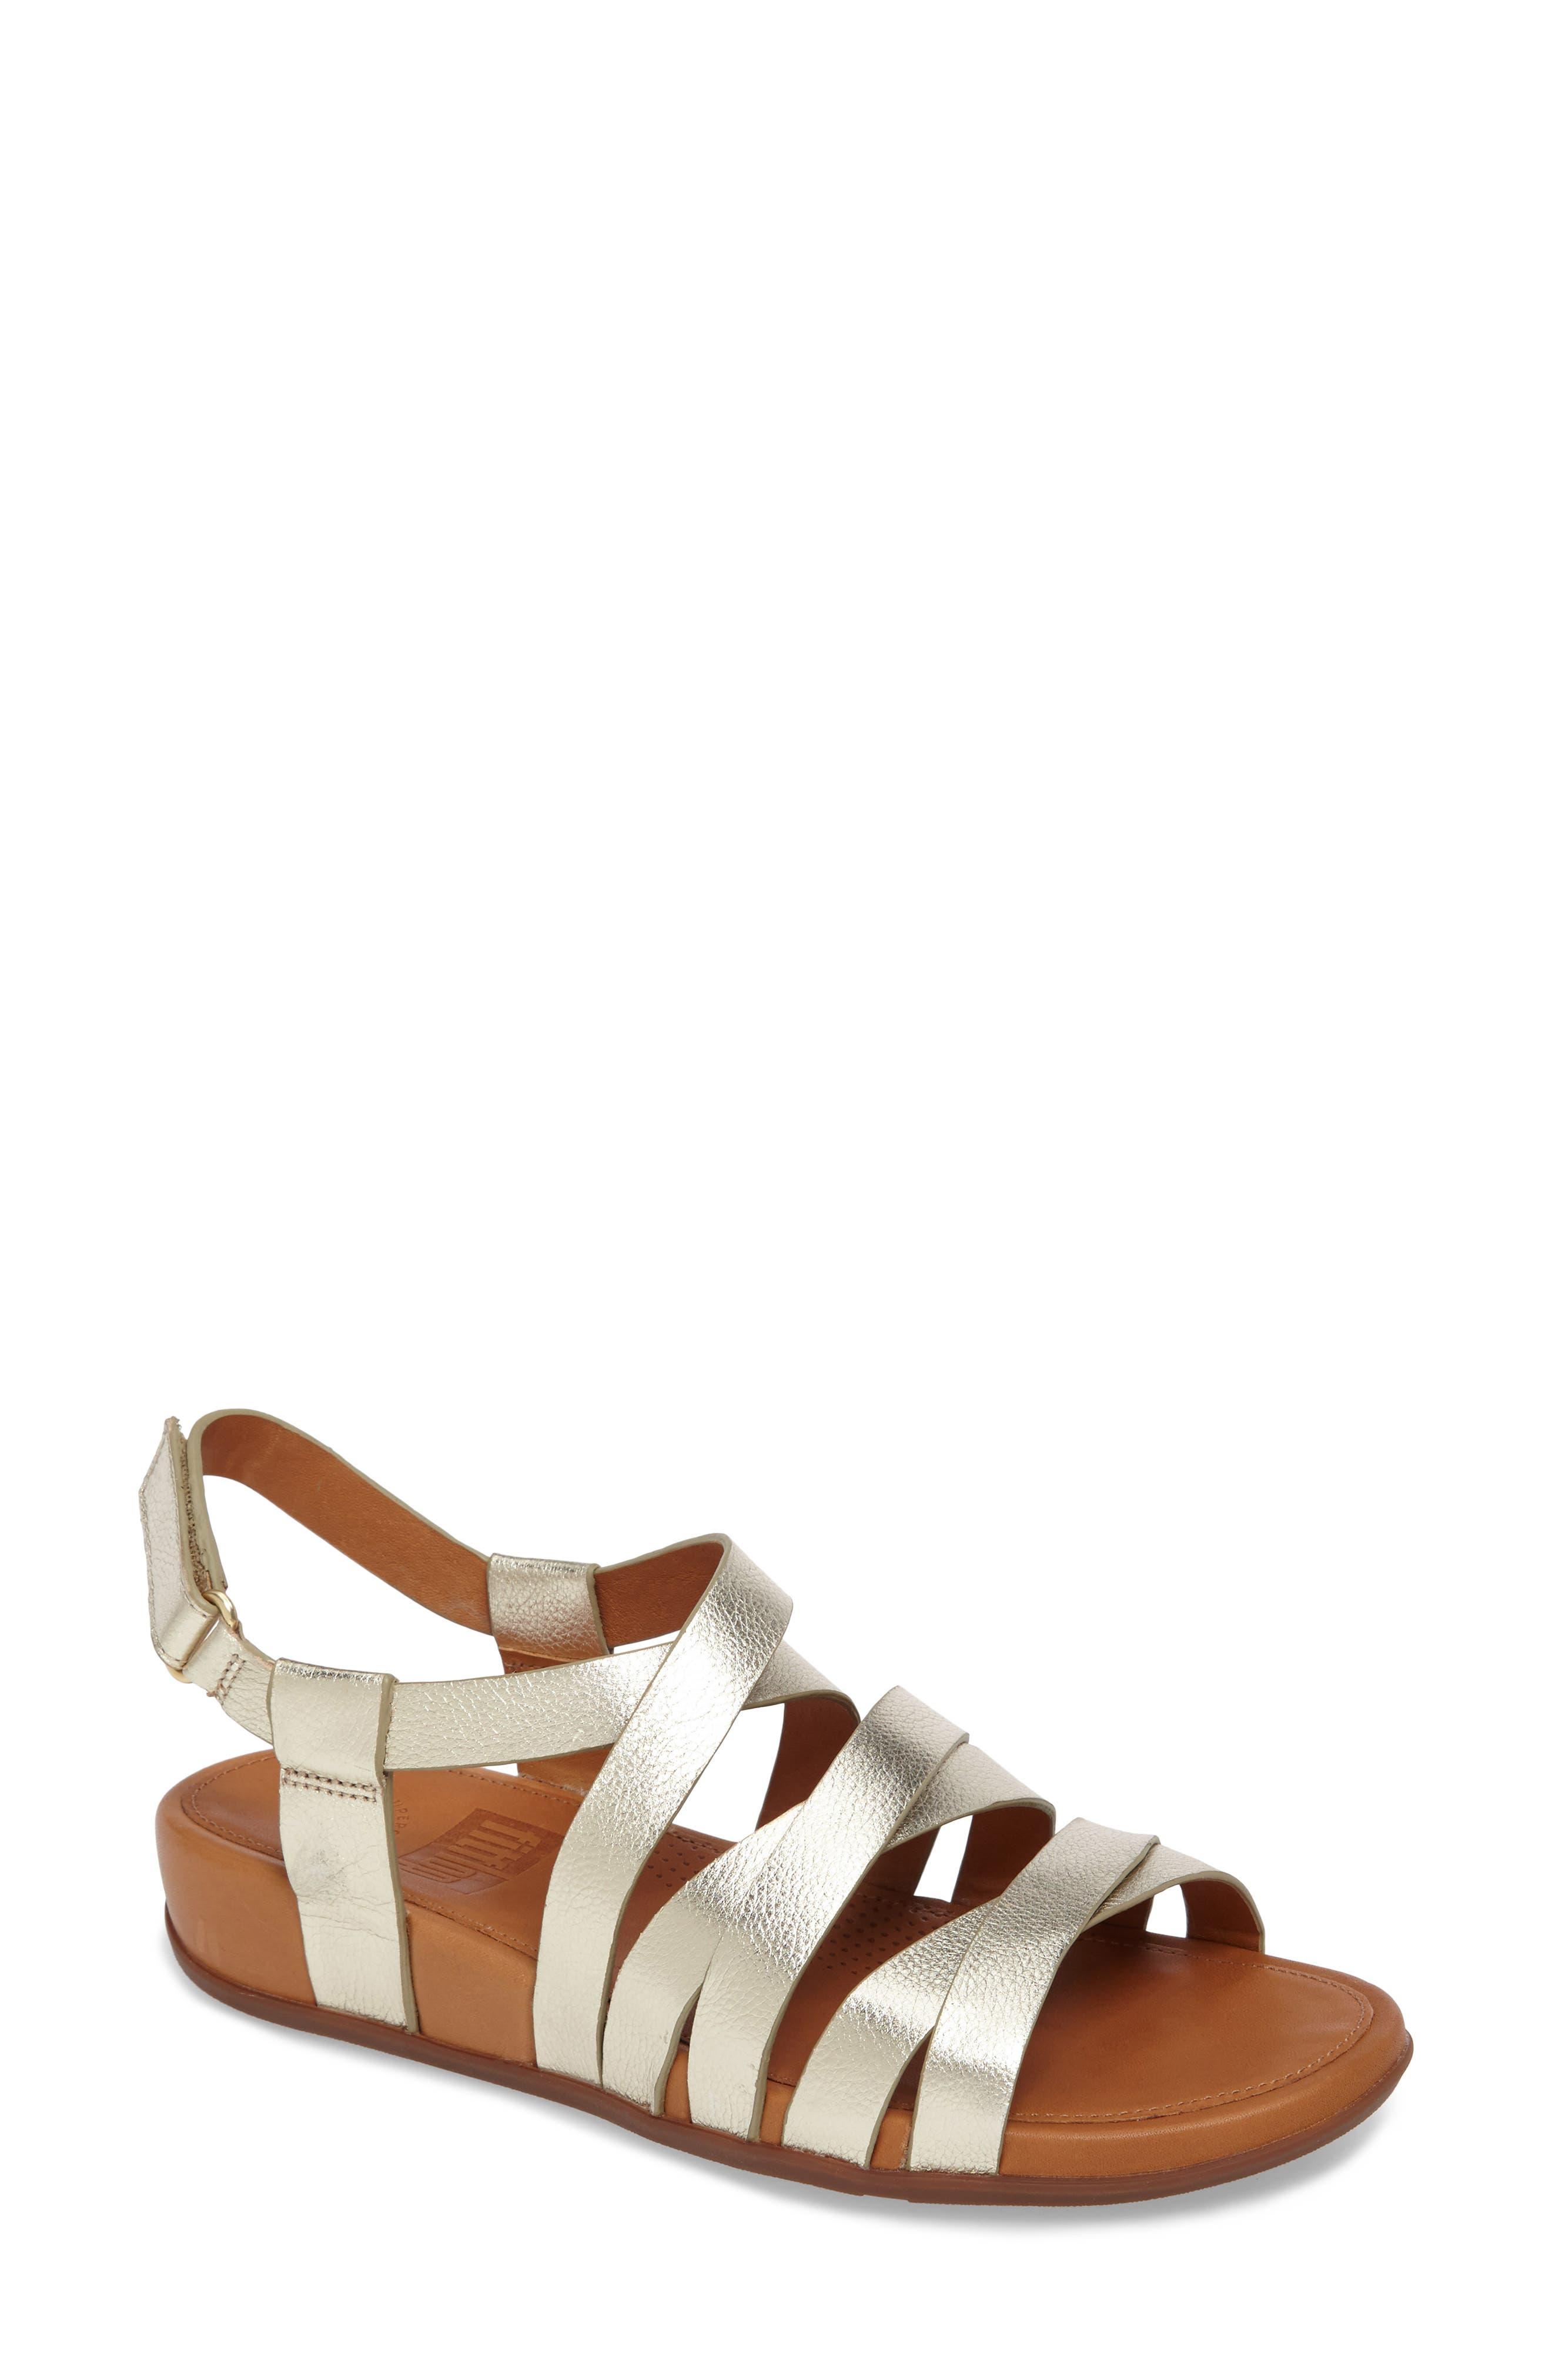 Main Image - FitFlop Lumy Gladiator Sandal (Women)